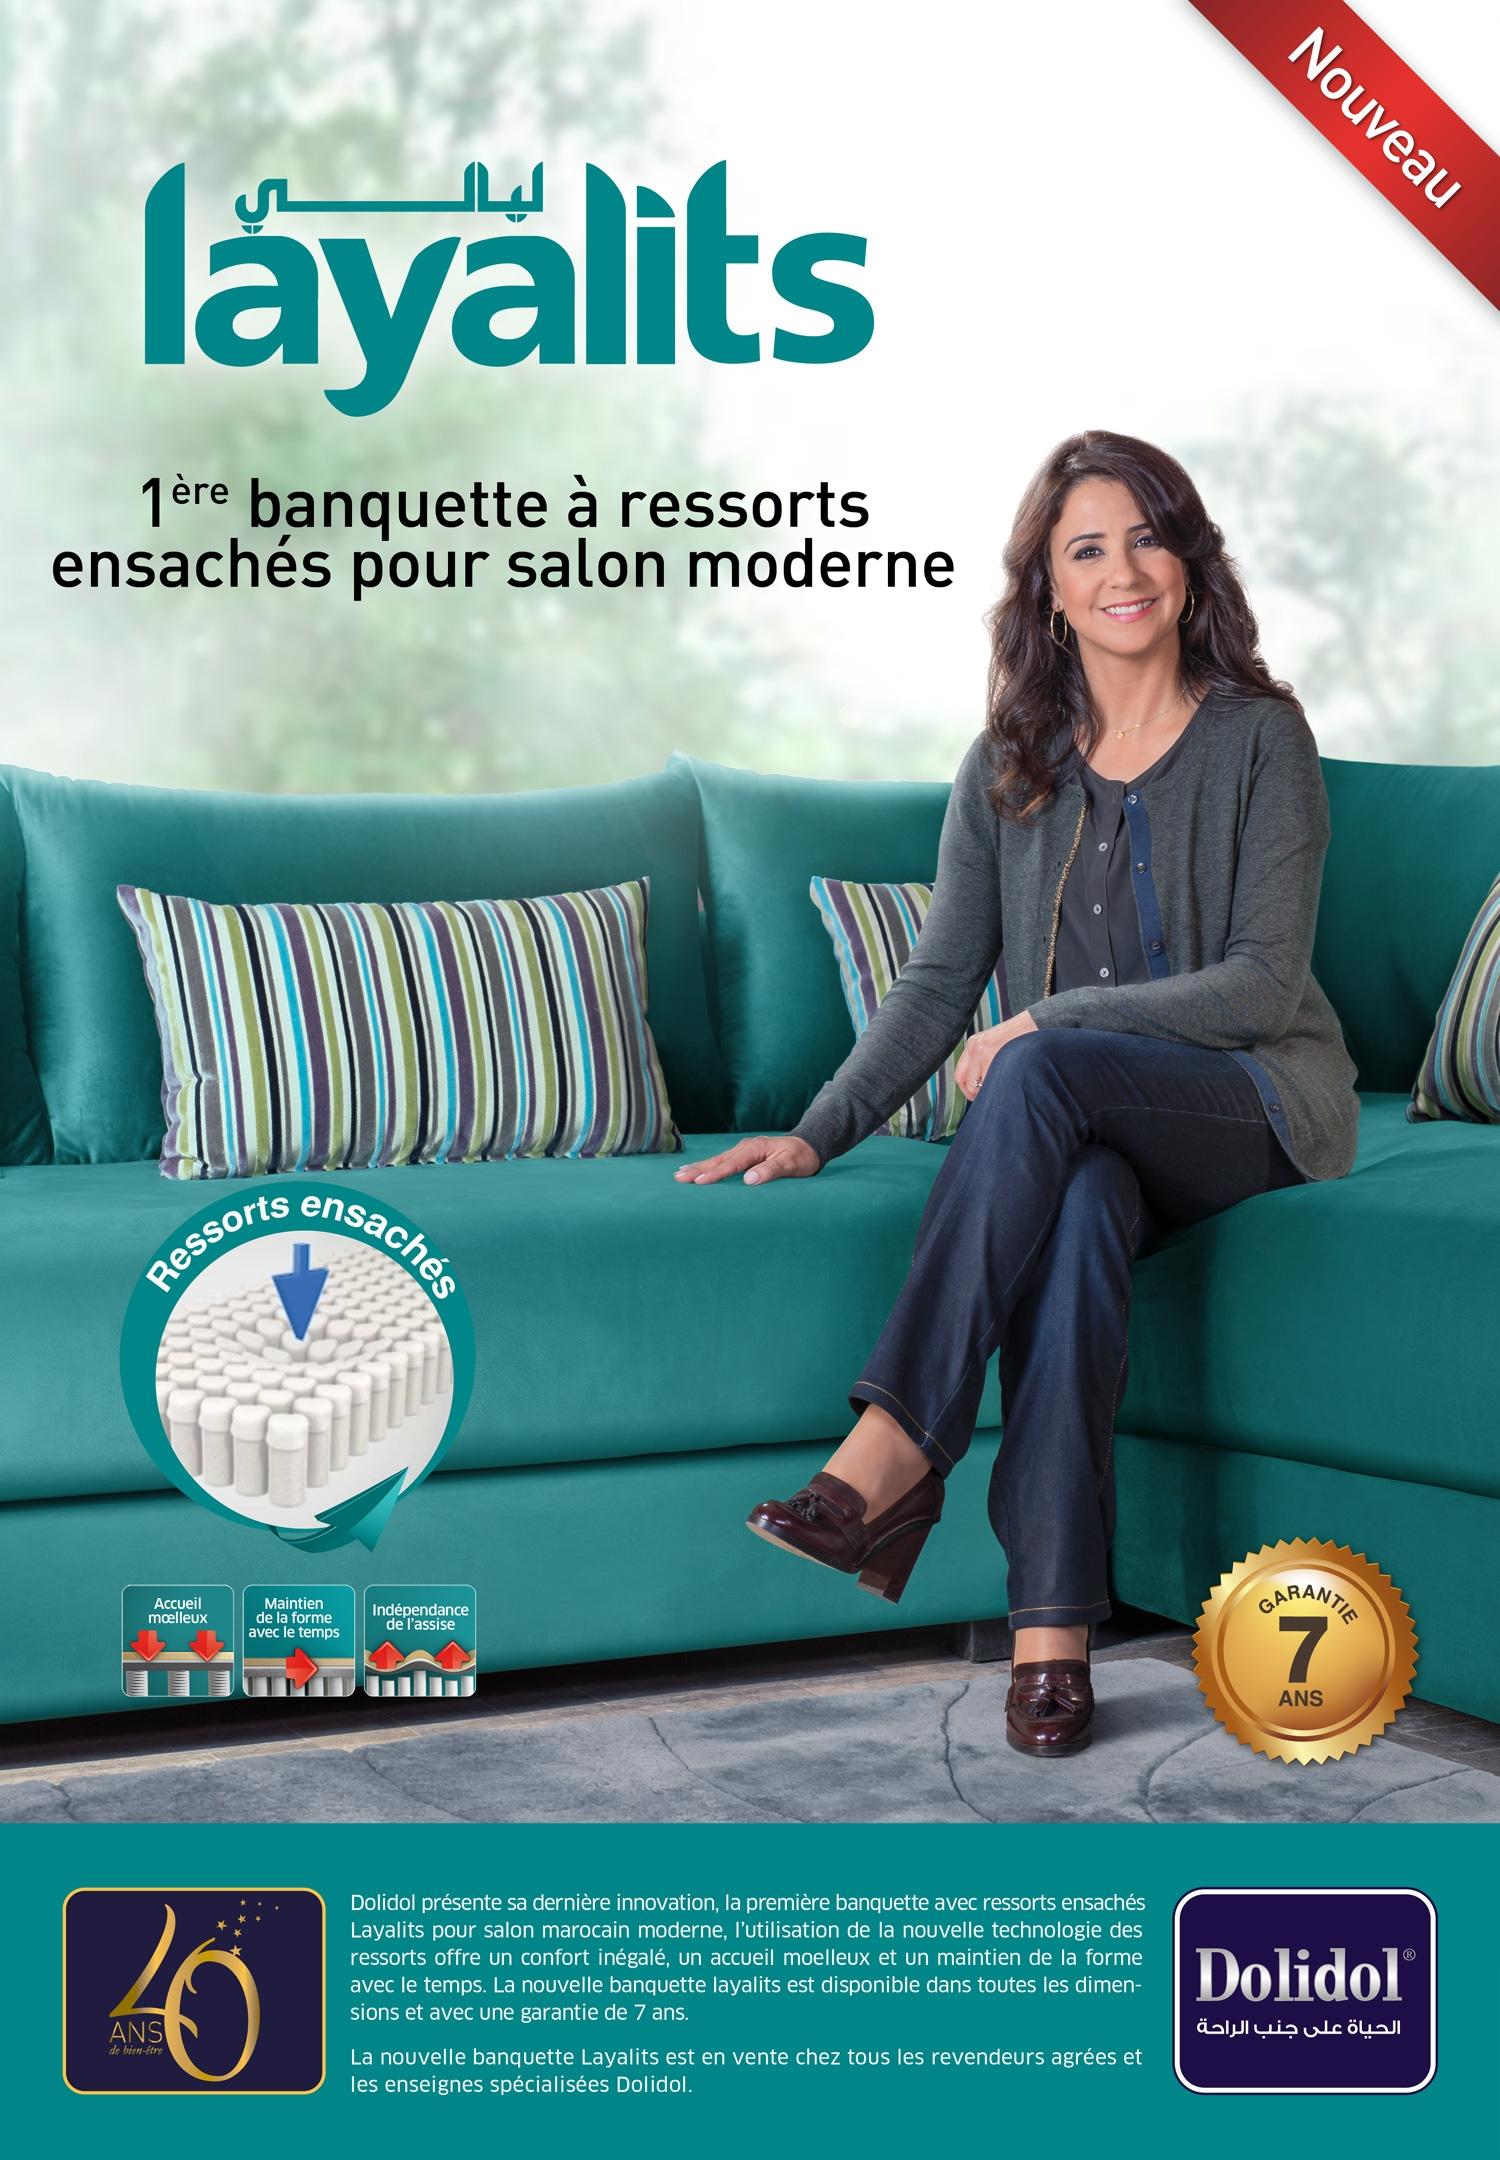 Salon Marocain Maroc Prix dolidol lance un nouveau salon a ressorts ensaches layalits